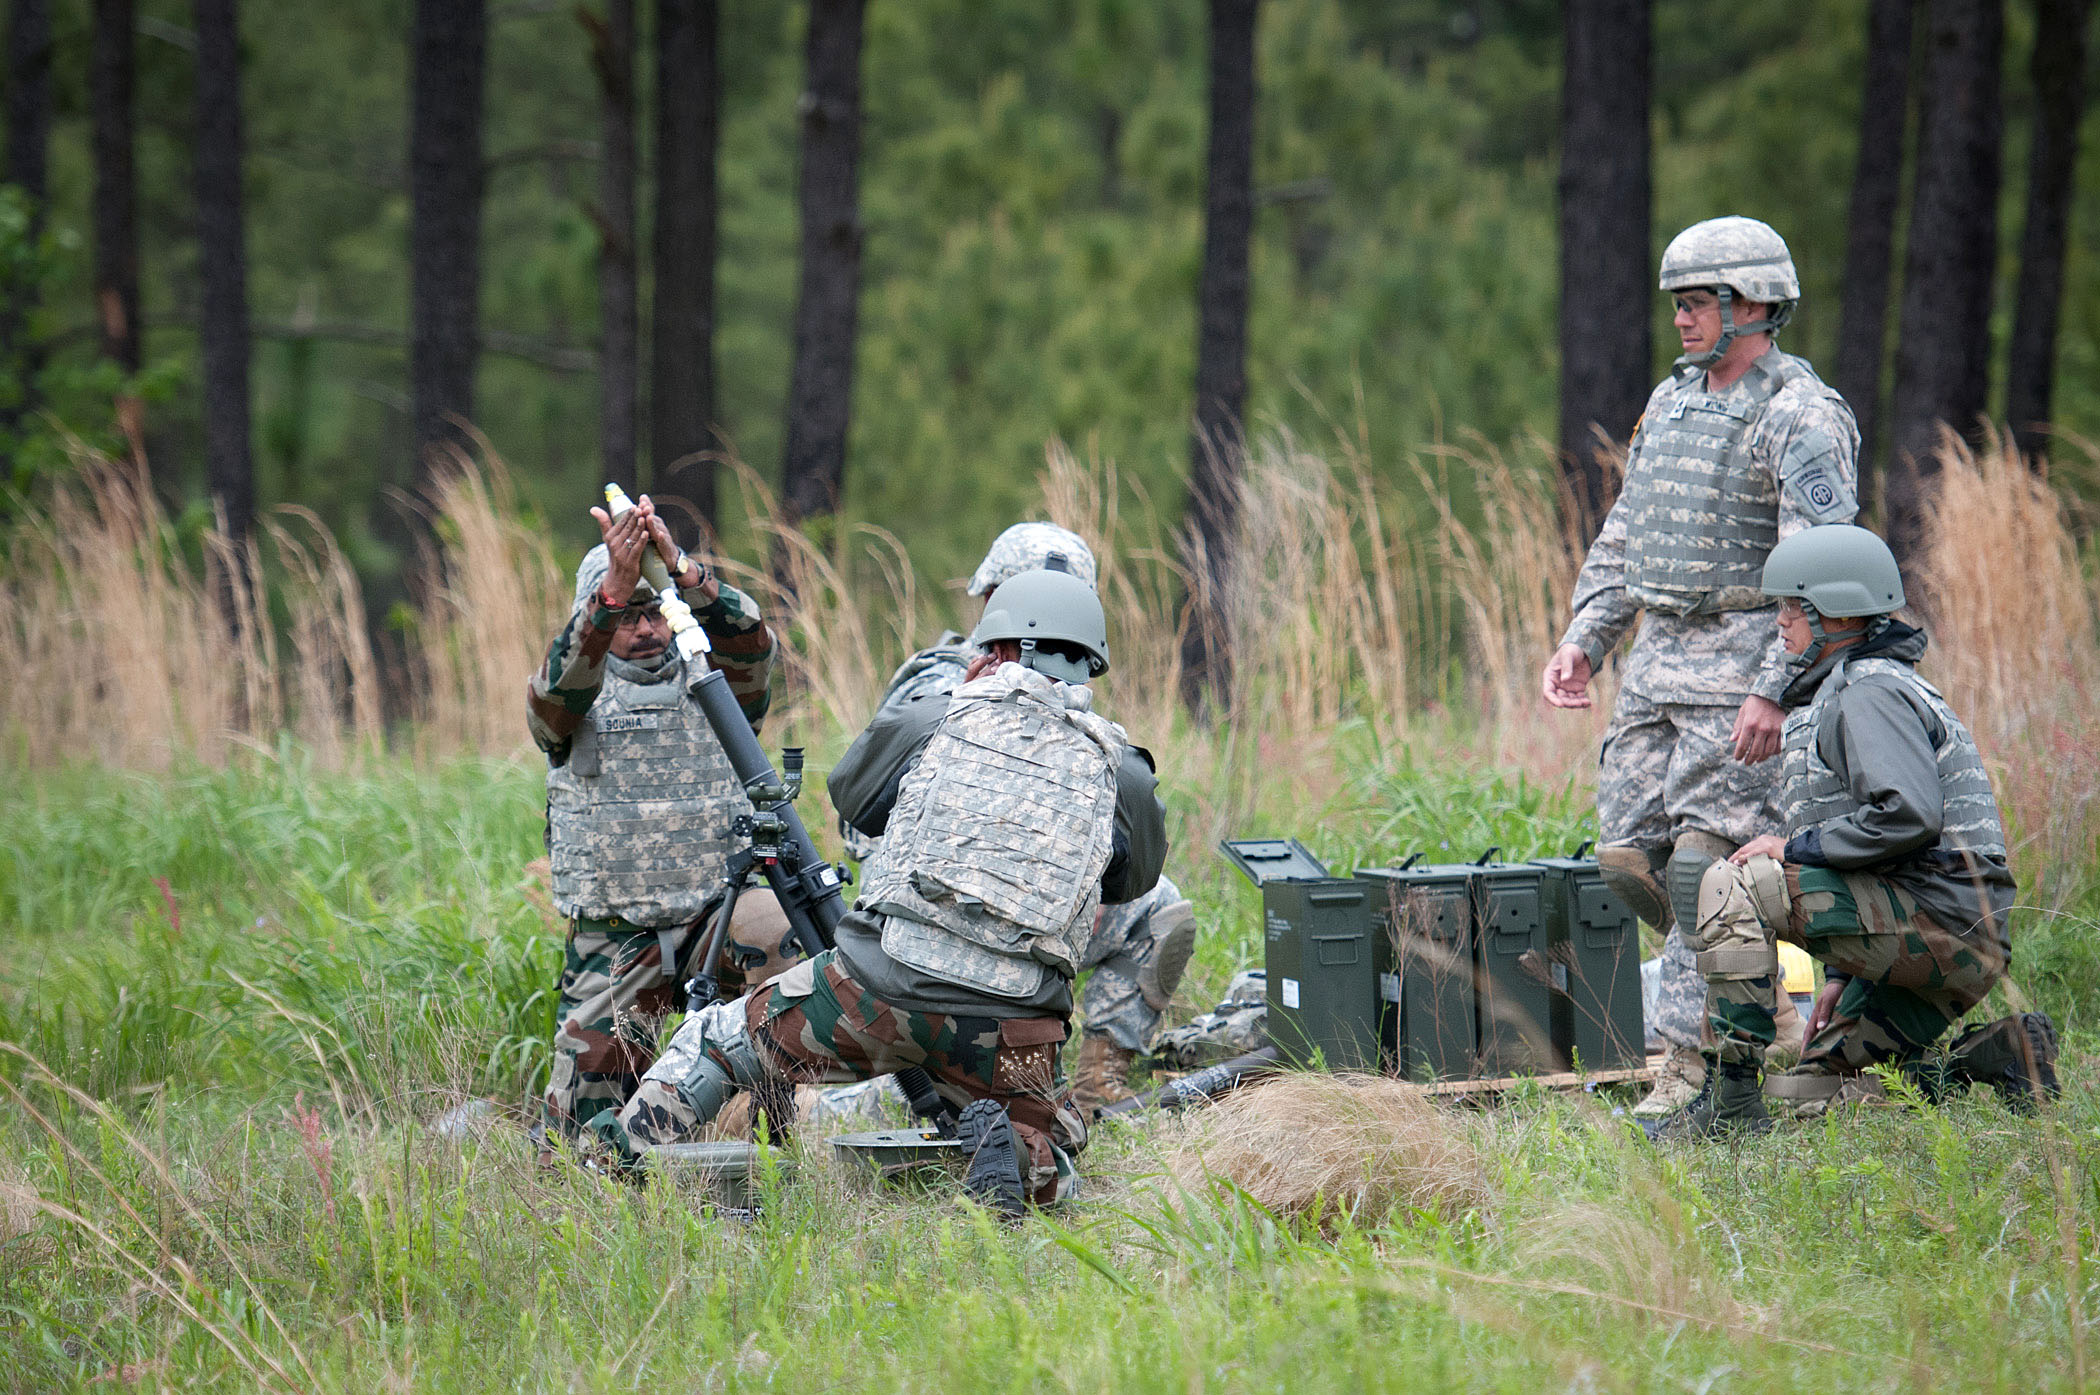 File:Indian Army Brig  Gen  Jagdish Chaudhari prepares to